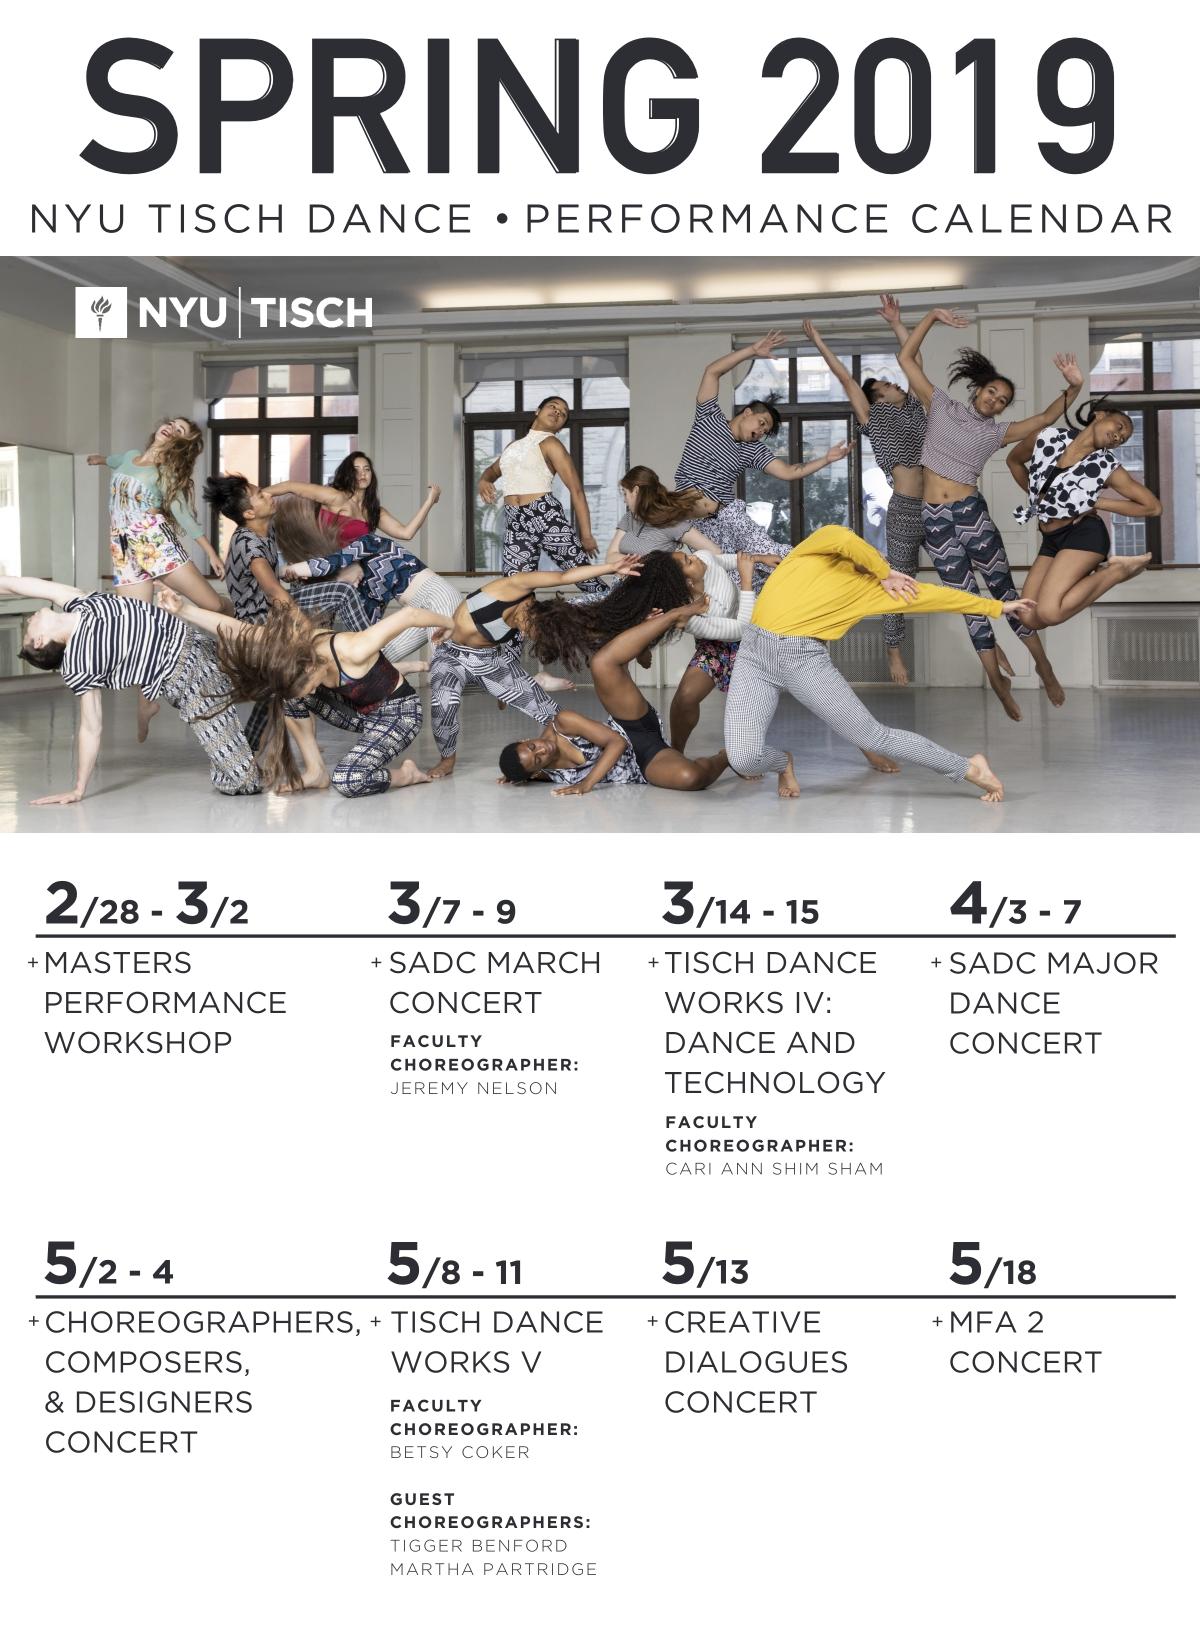 Nyu Academic Calendar Spring 2019 Spring 2019 Performance Calendar